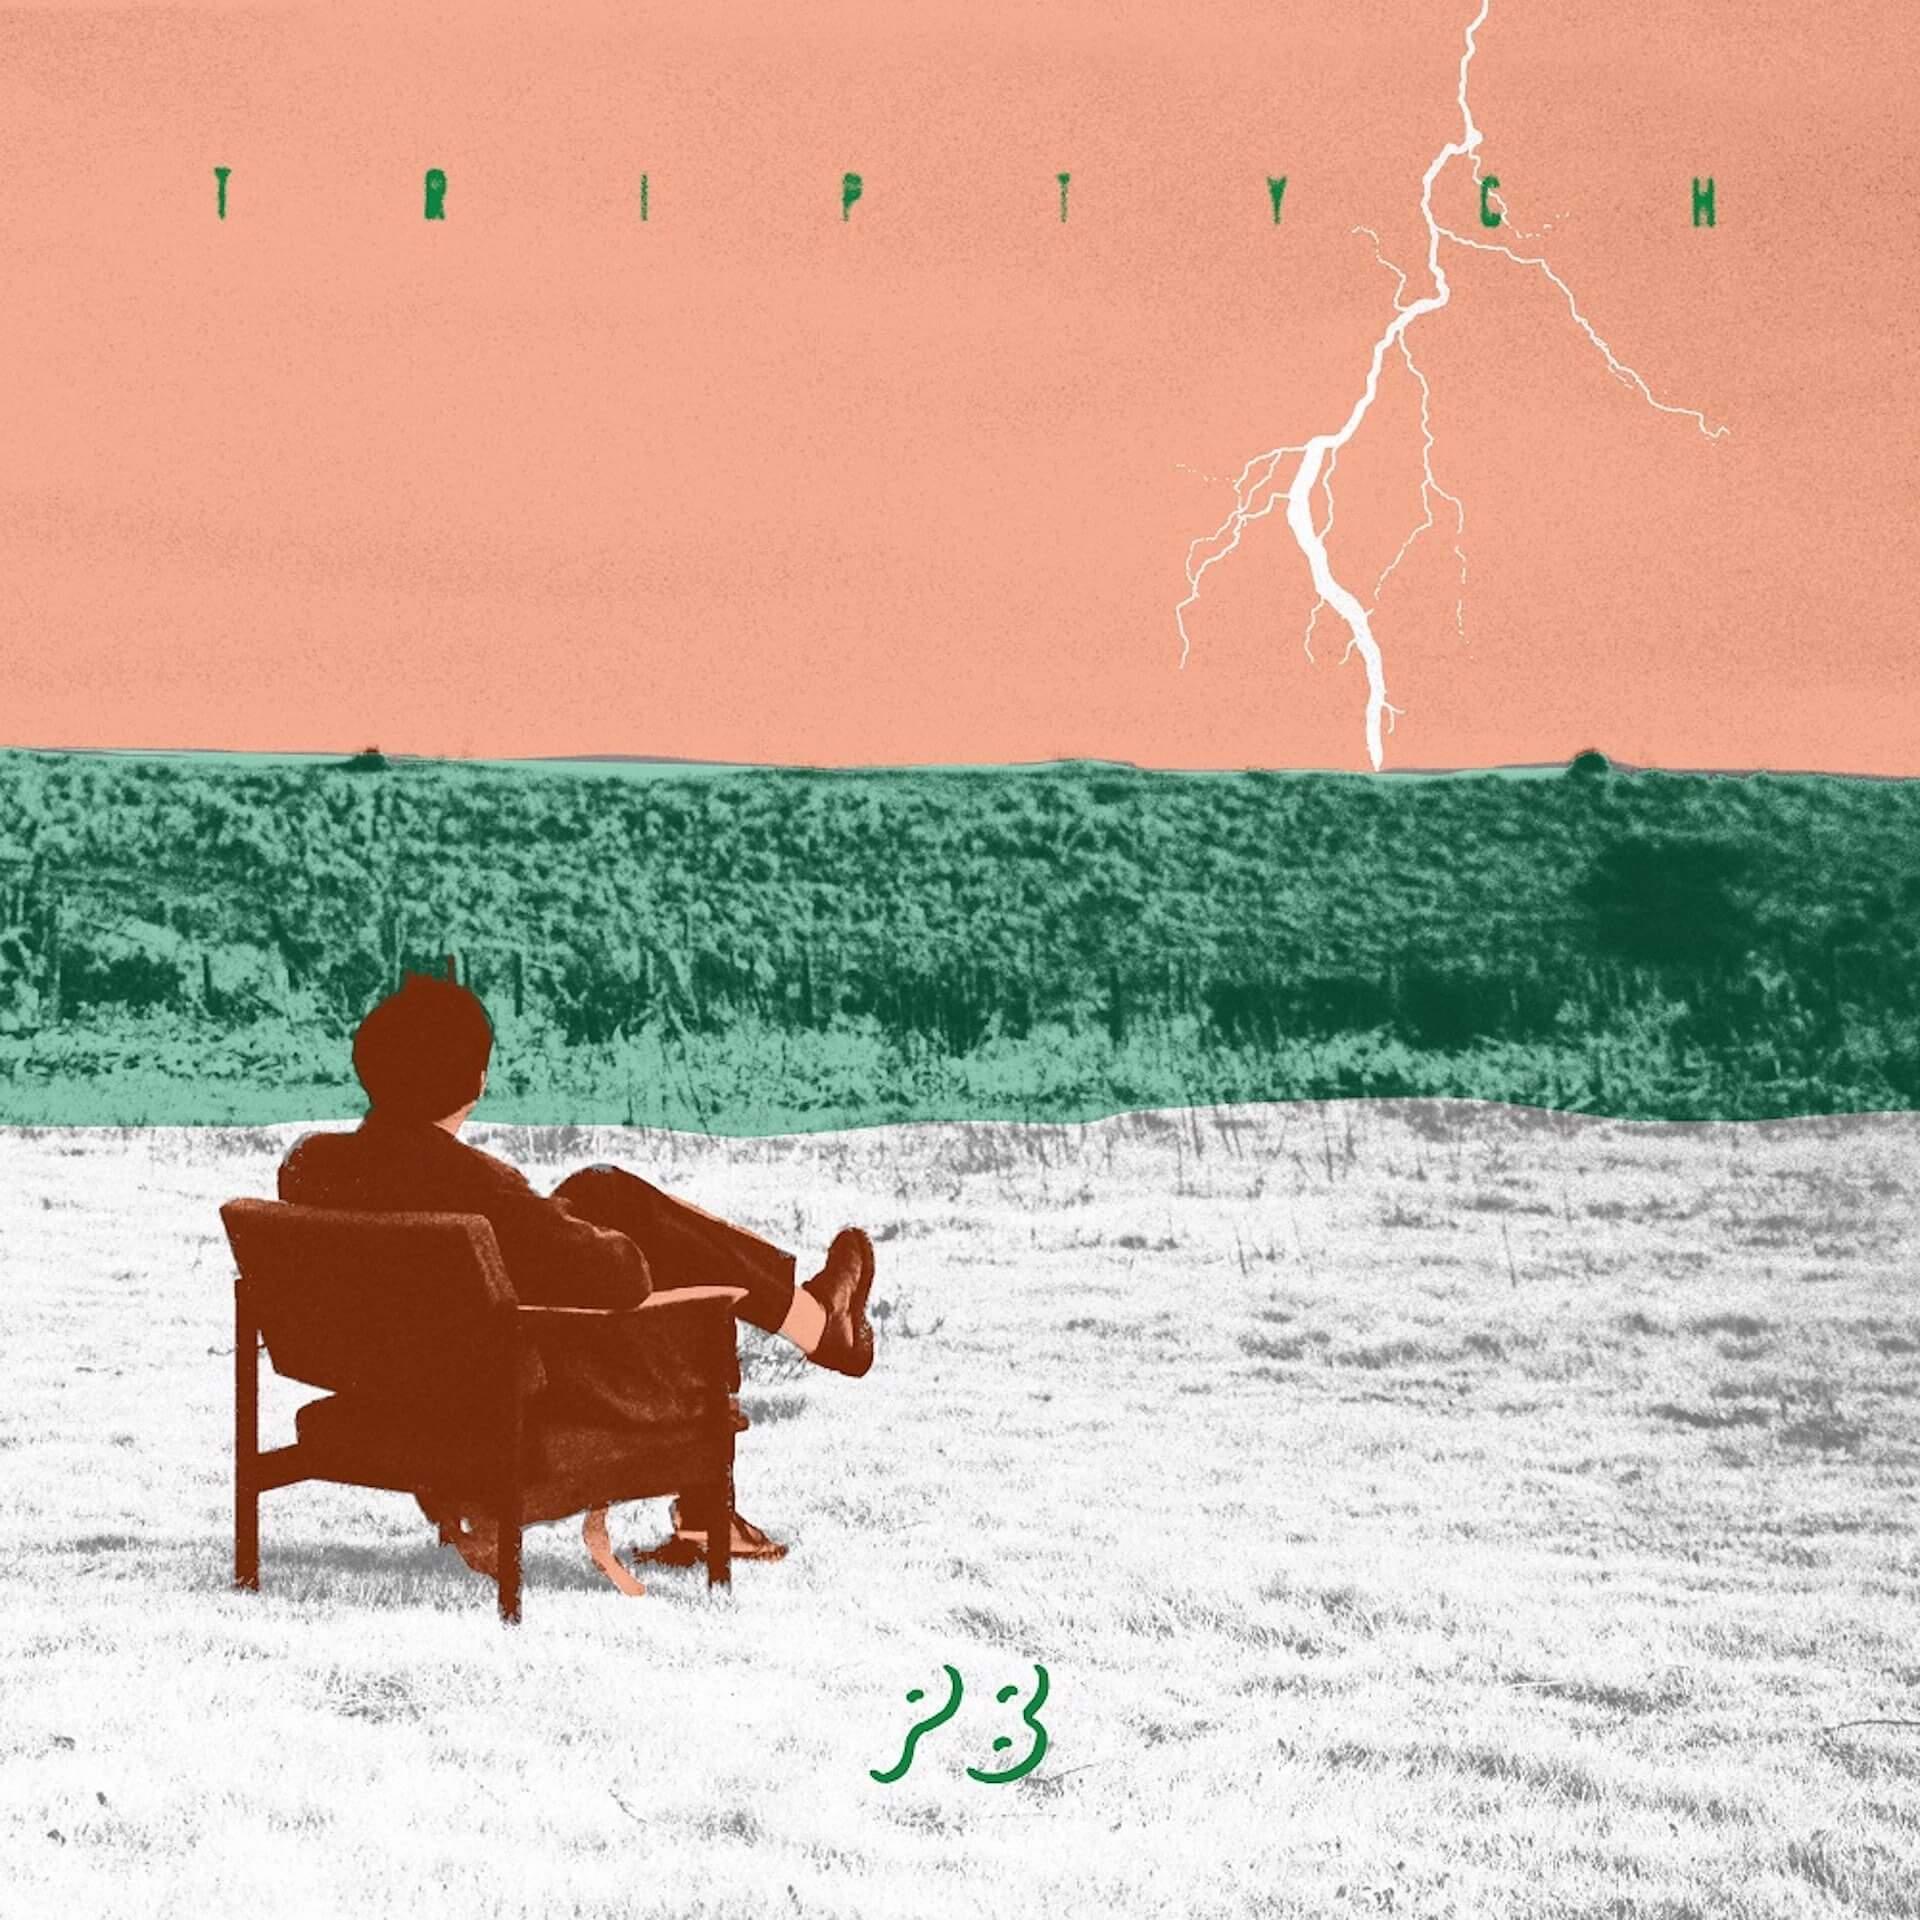 "cero髙城晶平ソロプロジェクト・Shohei Takagi Parallela Botanicaの1stアルバム『Triptych』収録曲""オー・ウェル""が聴けるティザー映像第3弾公開! music200406_triptych_03"